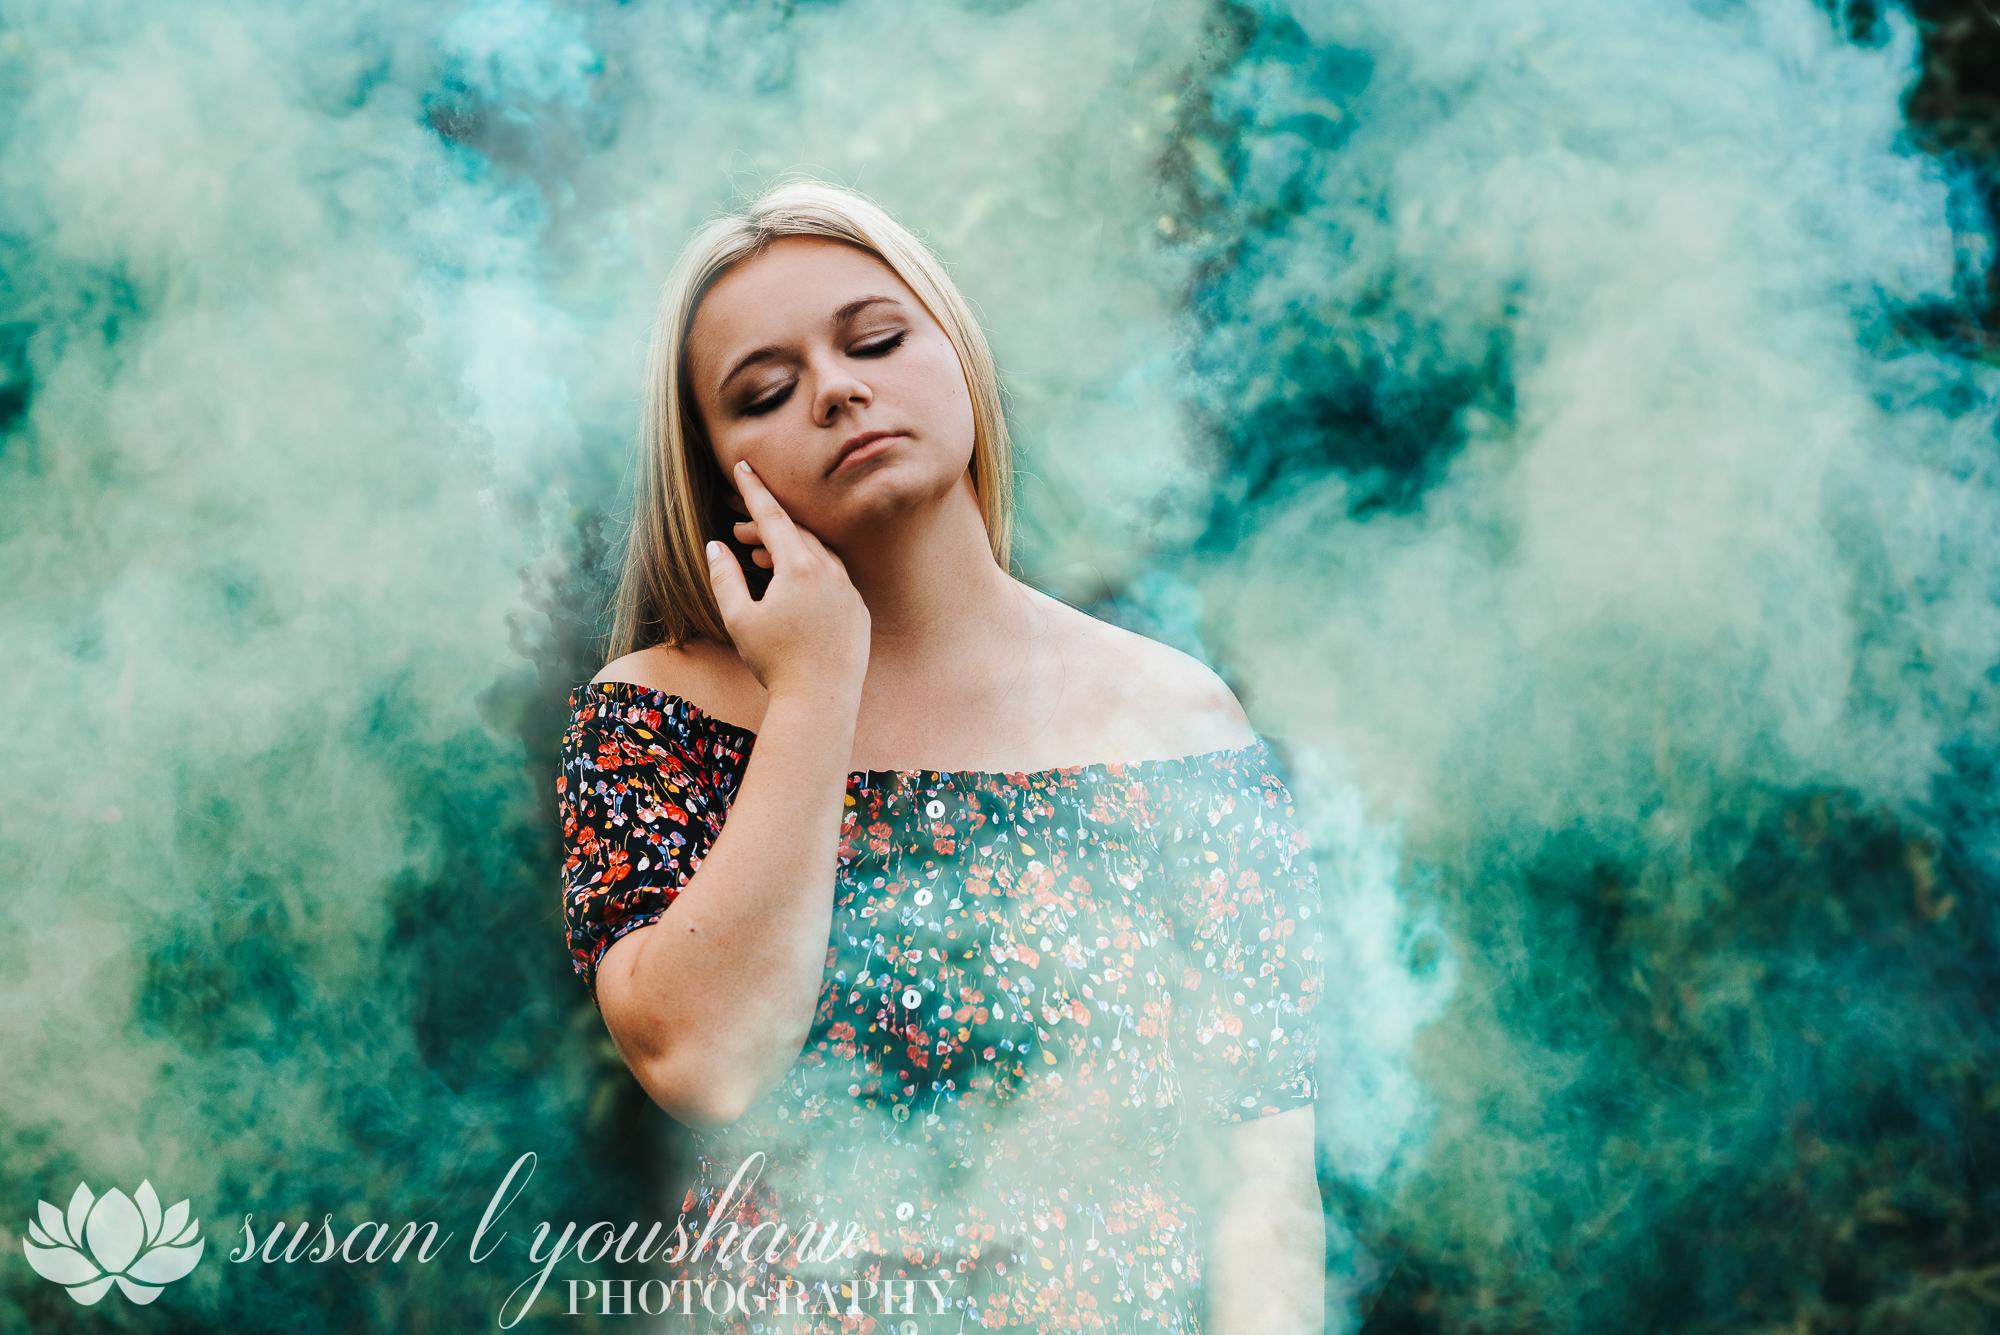 BLOG Karrie Bower 08-16-2018 SLY Photography LLC-10.jpg